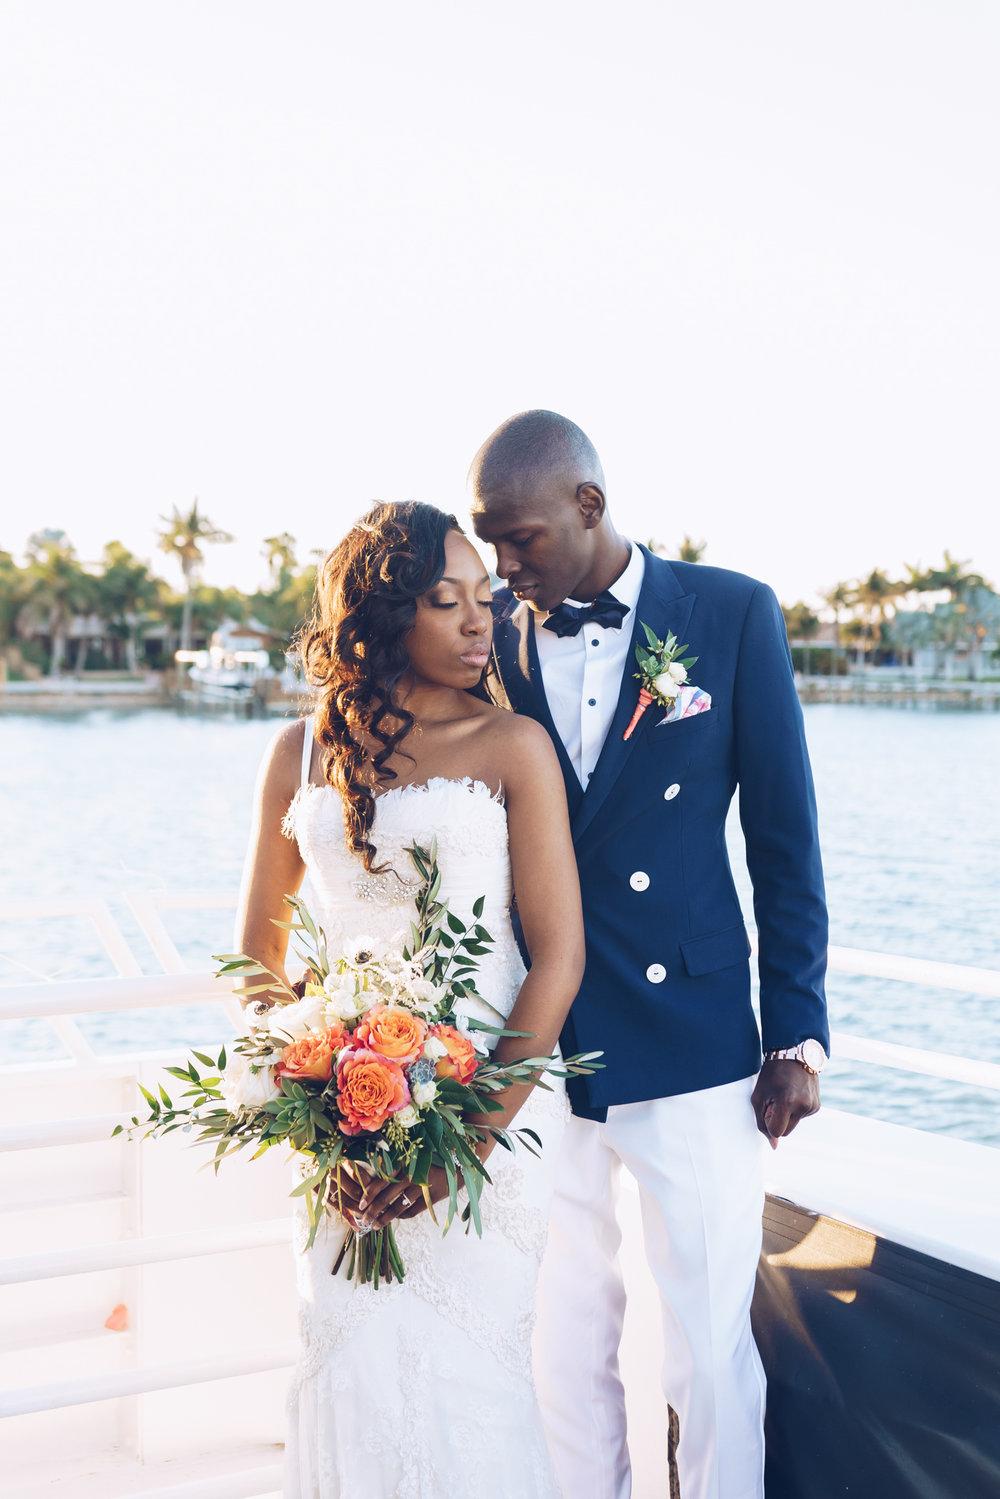 St.Pete-wedding-photography, Yacht-wedding-photo